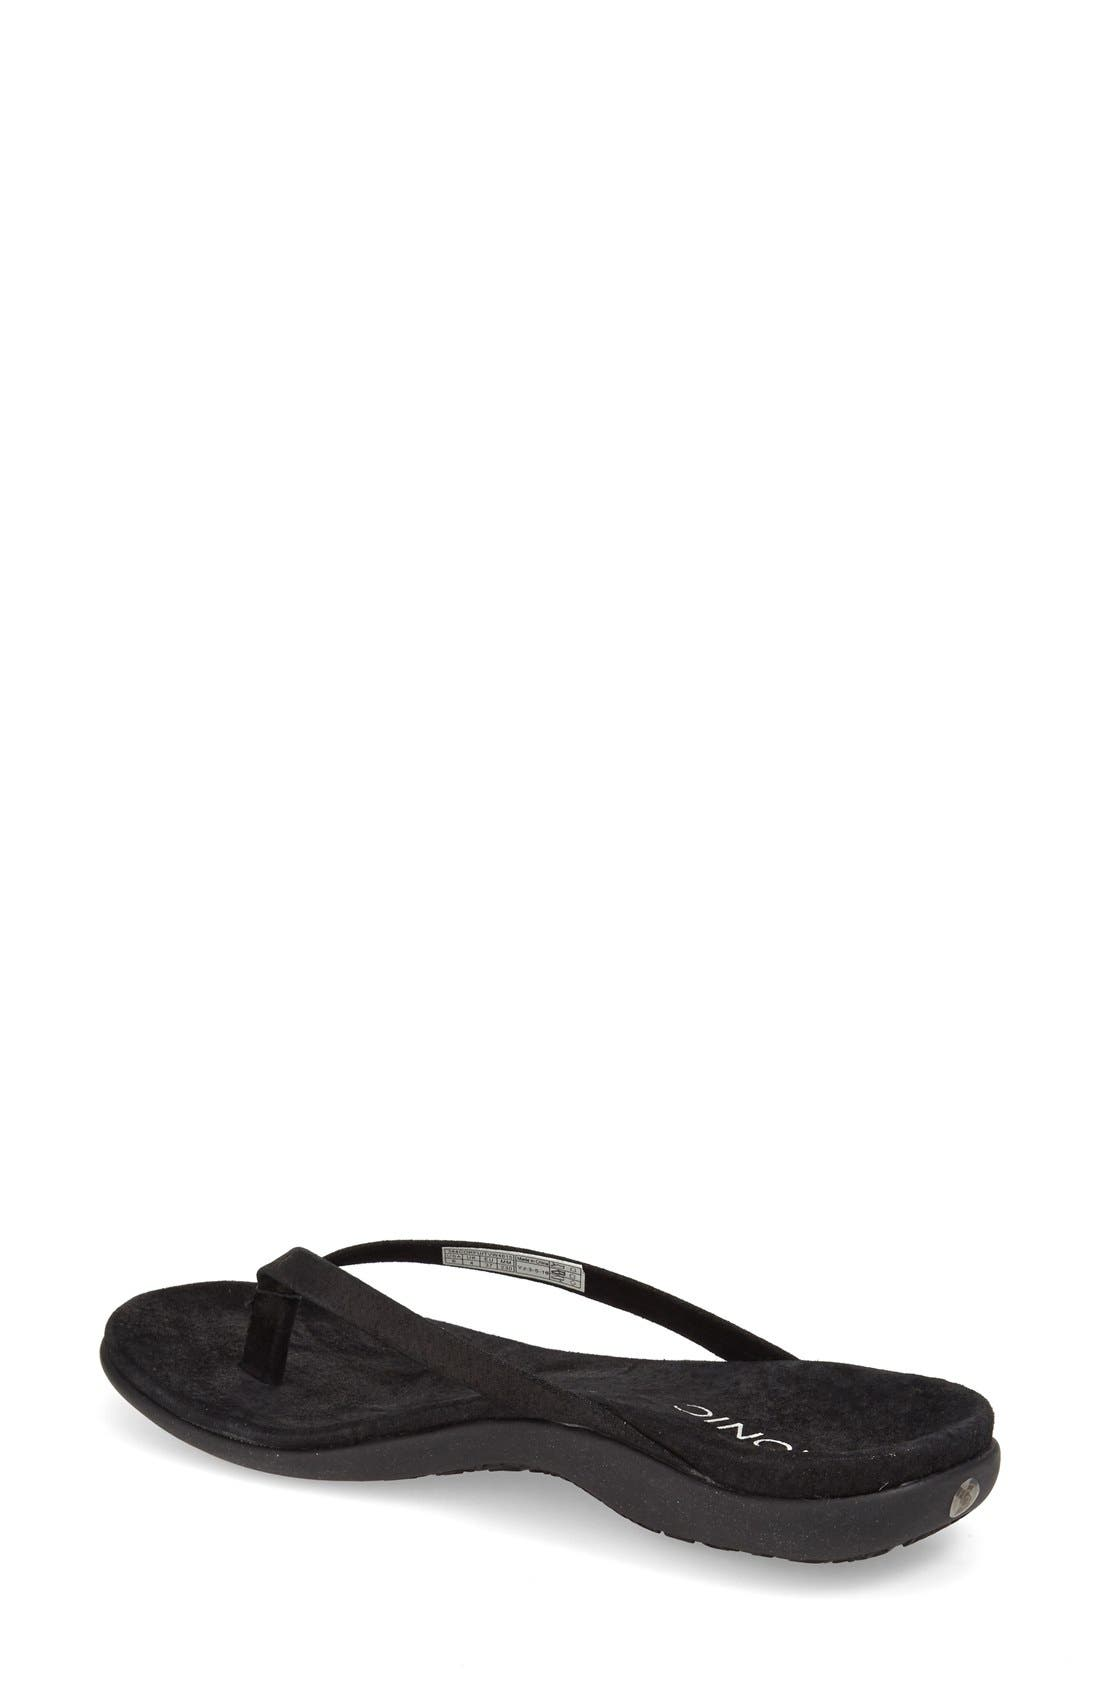 Alternate Image 2  - Vionic 'Corfu' Sandal (Women)